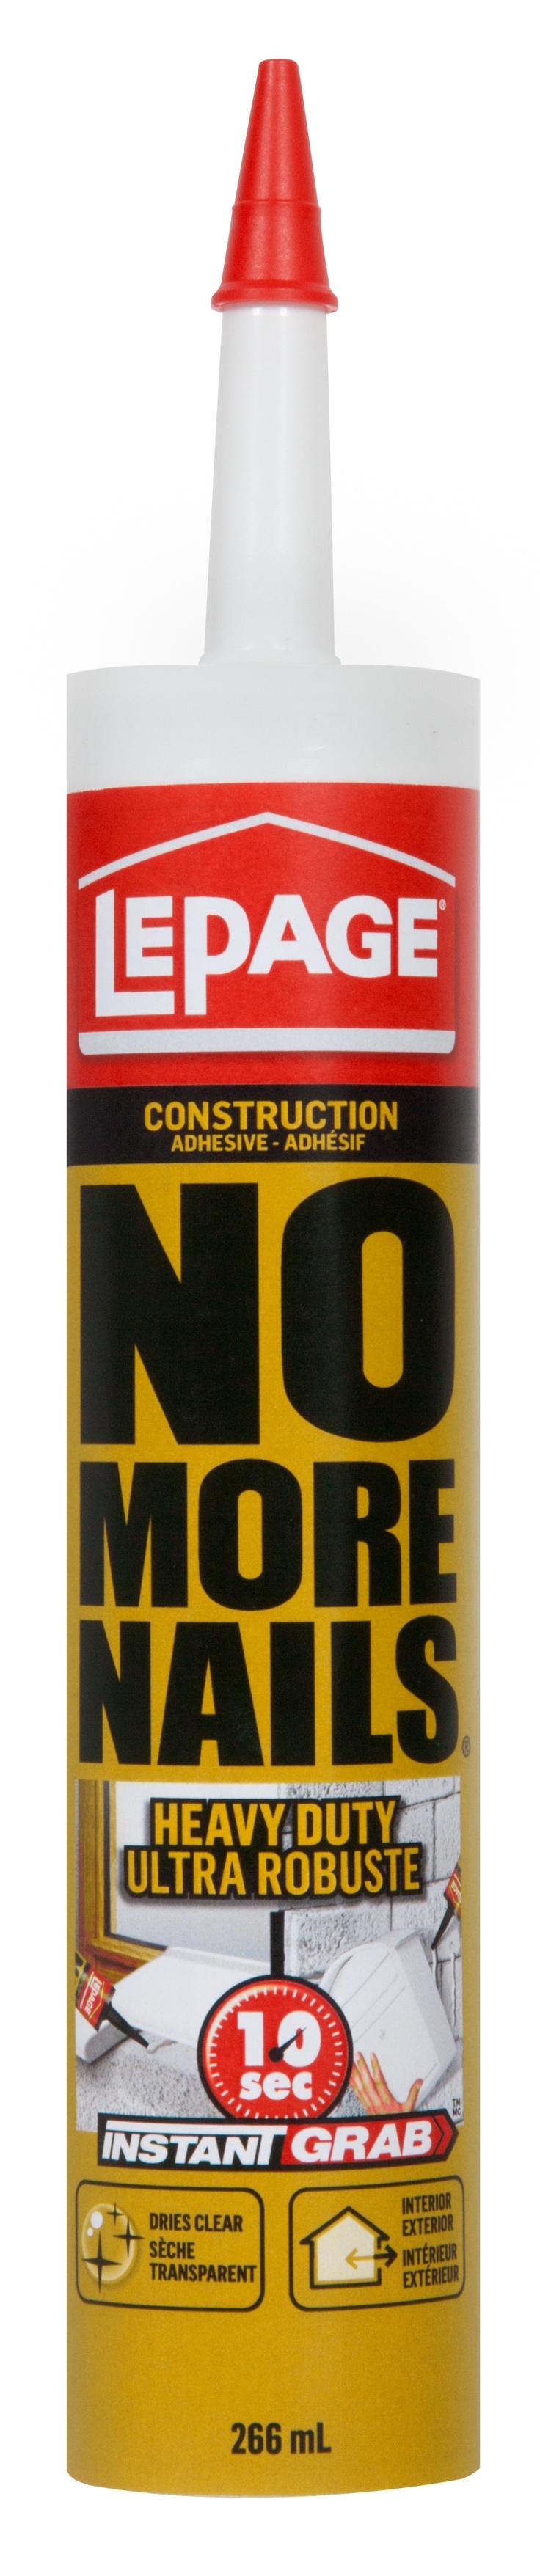 Home Depot Wallpaper Seam Adhesive